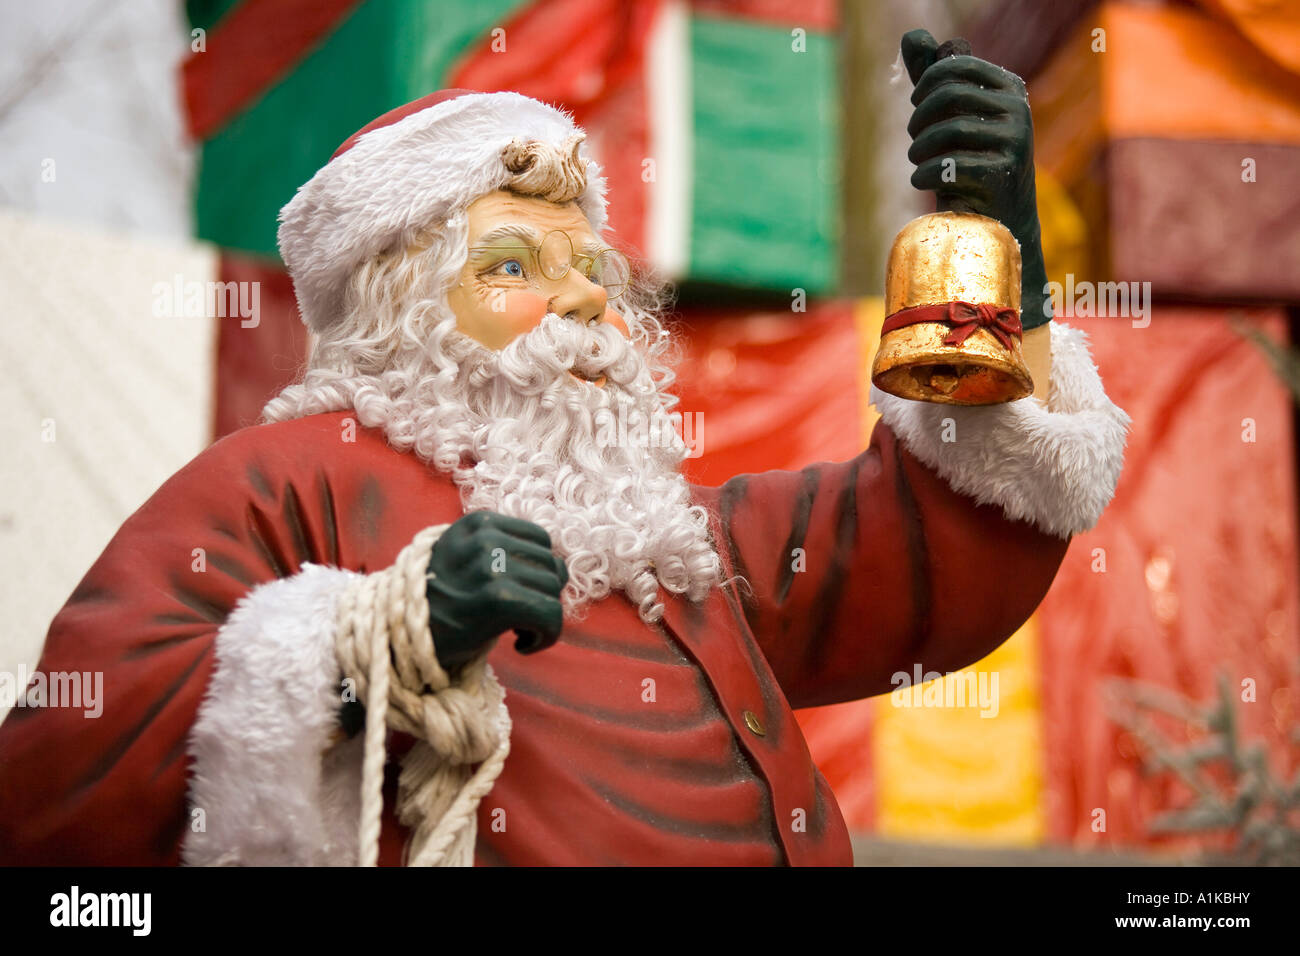 Santa Claus, Europa-Park Rust, Baden-Wuerttemberg, Germany - Stock Image